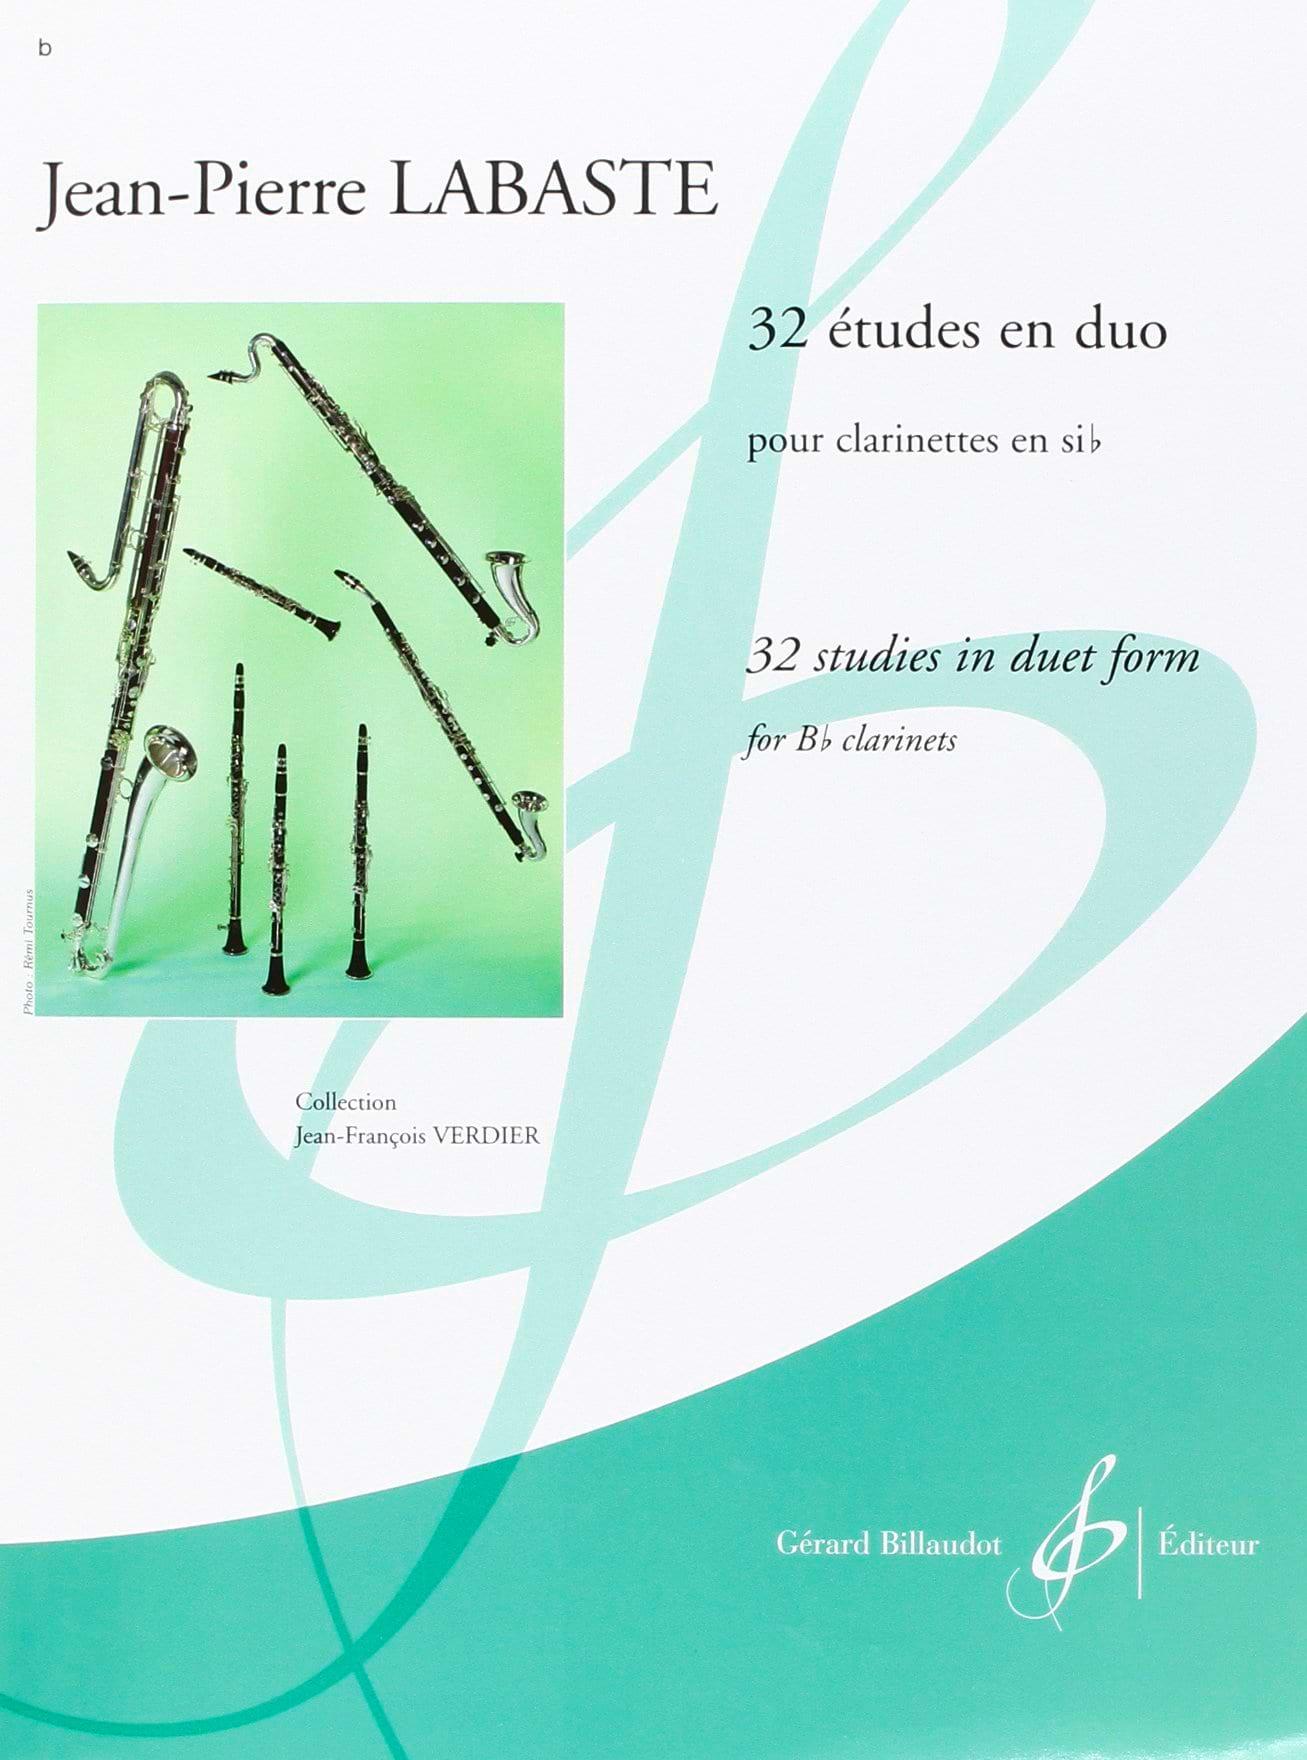 32 Etudes en duo - Jean-Pierre Labaste - Partition - laflutedepan.com